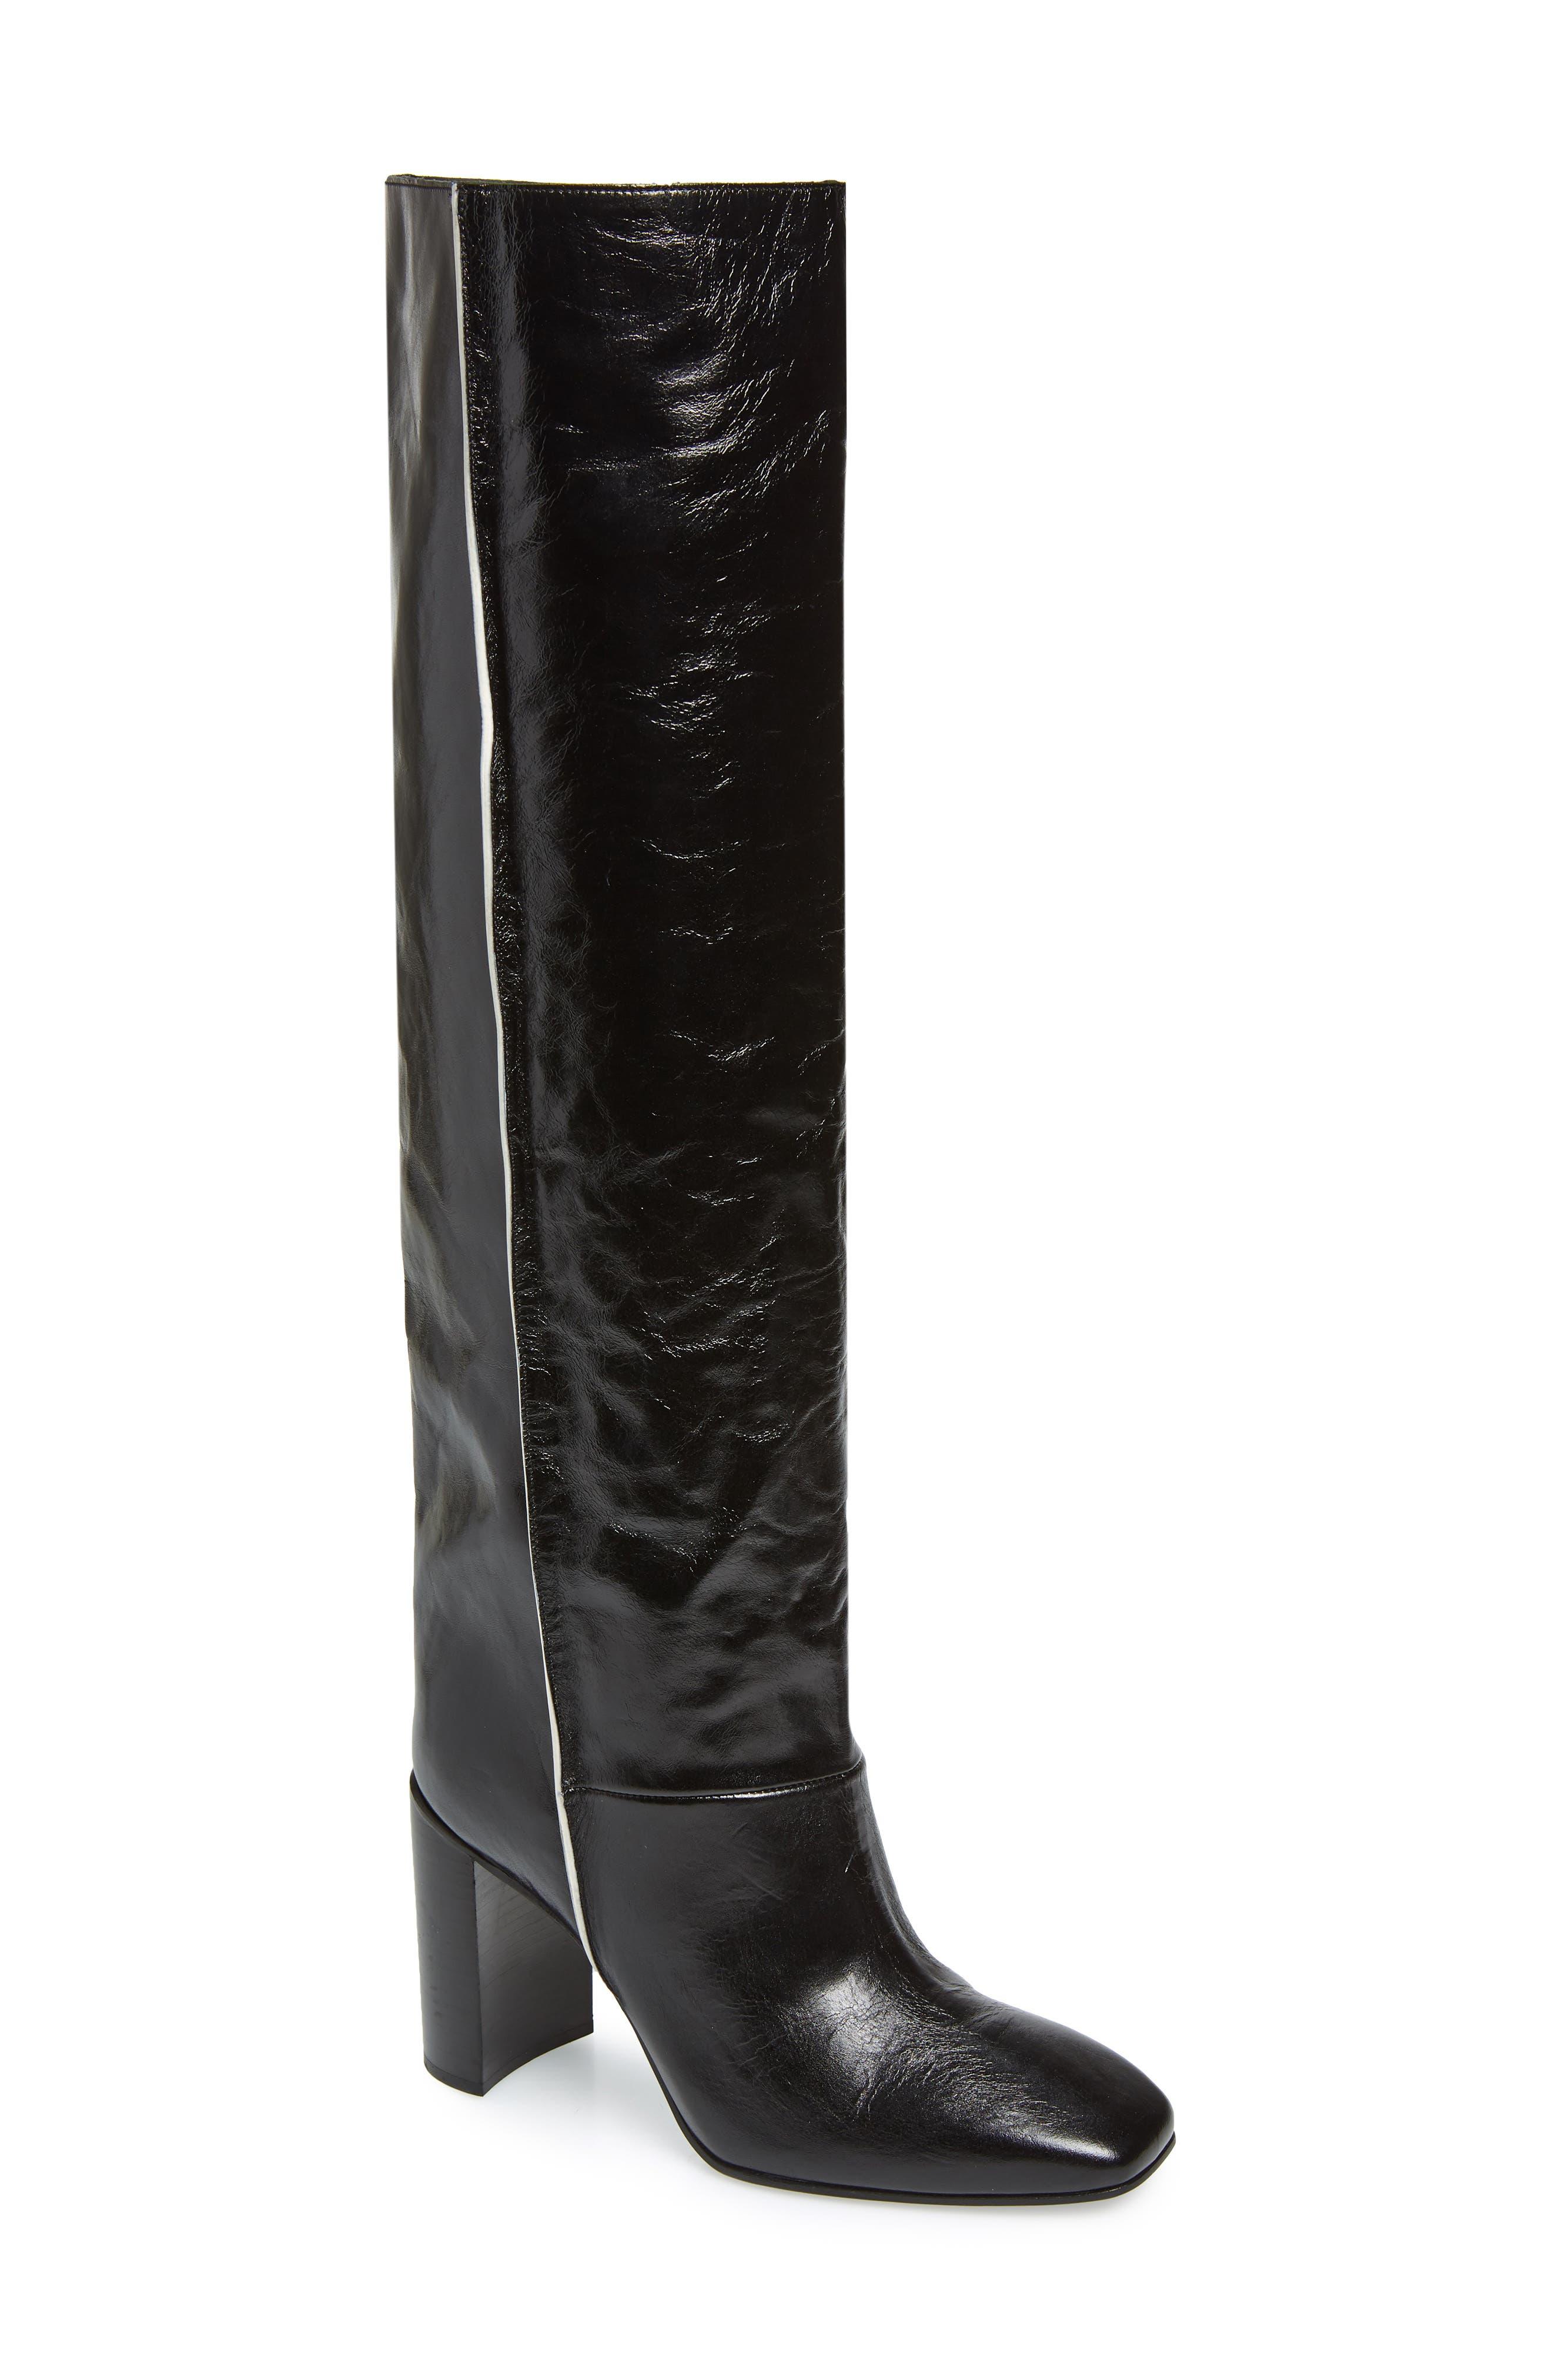 Rag & Bone Aslen Tall Boot, Black